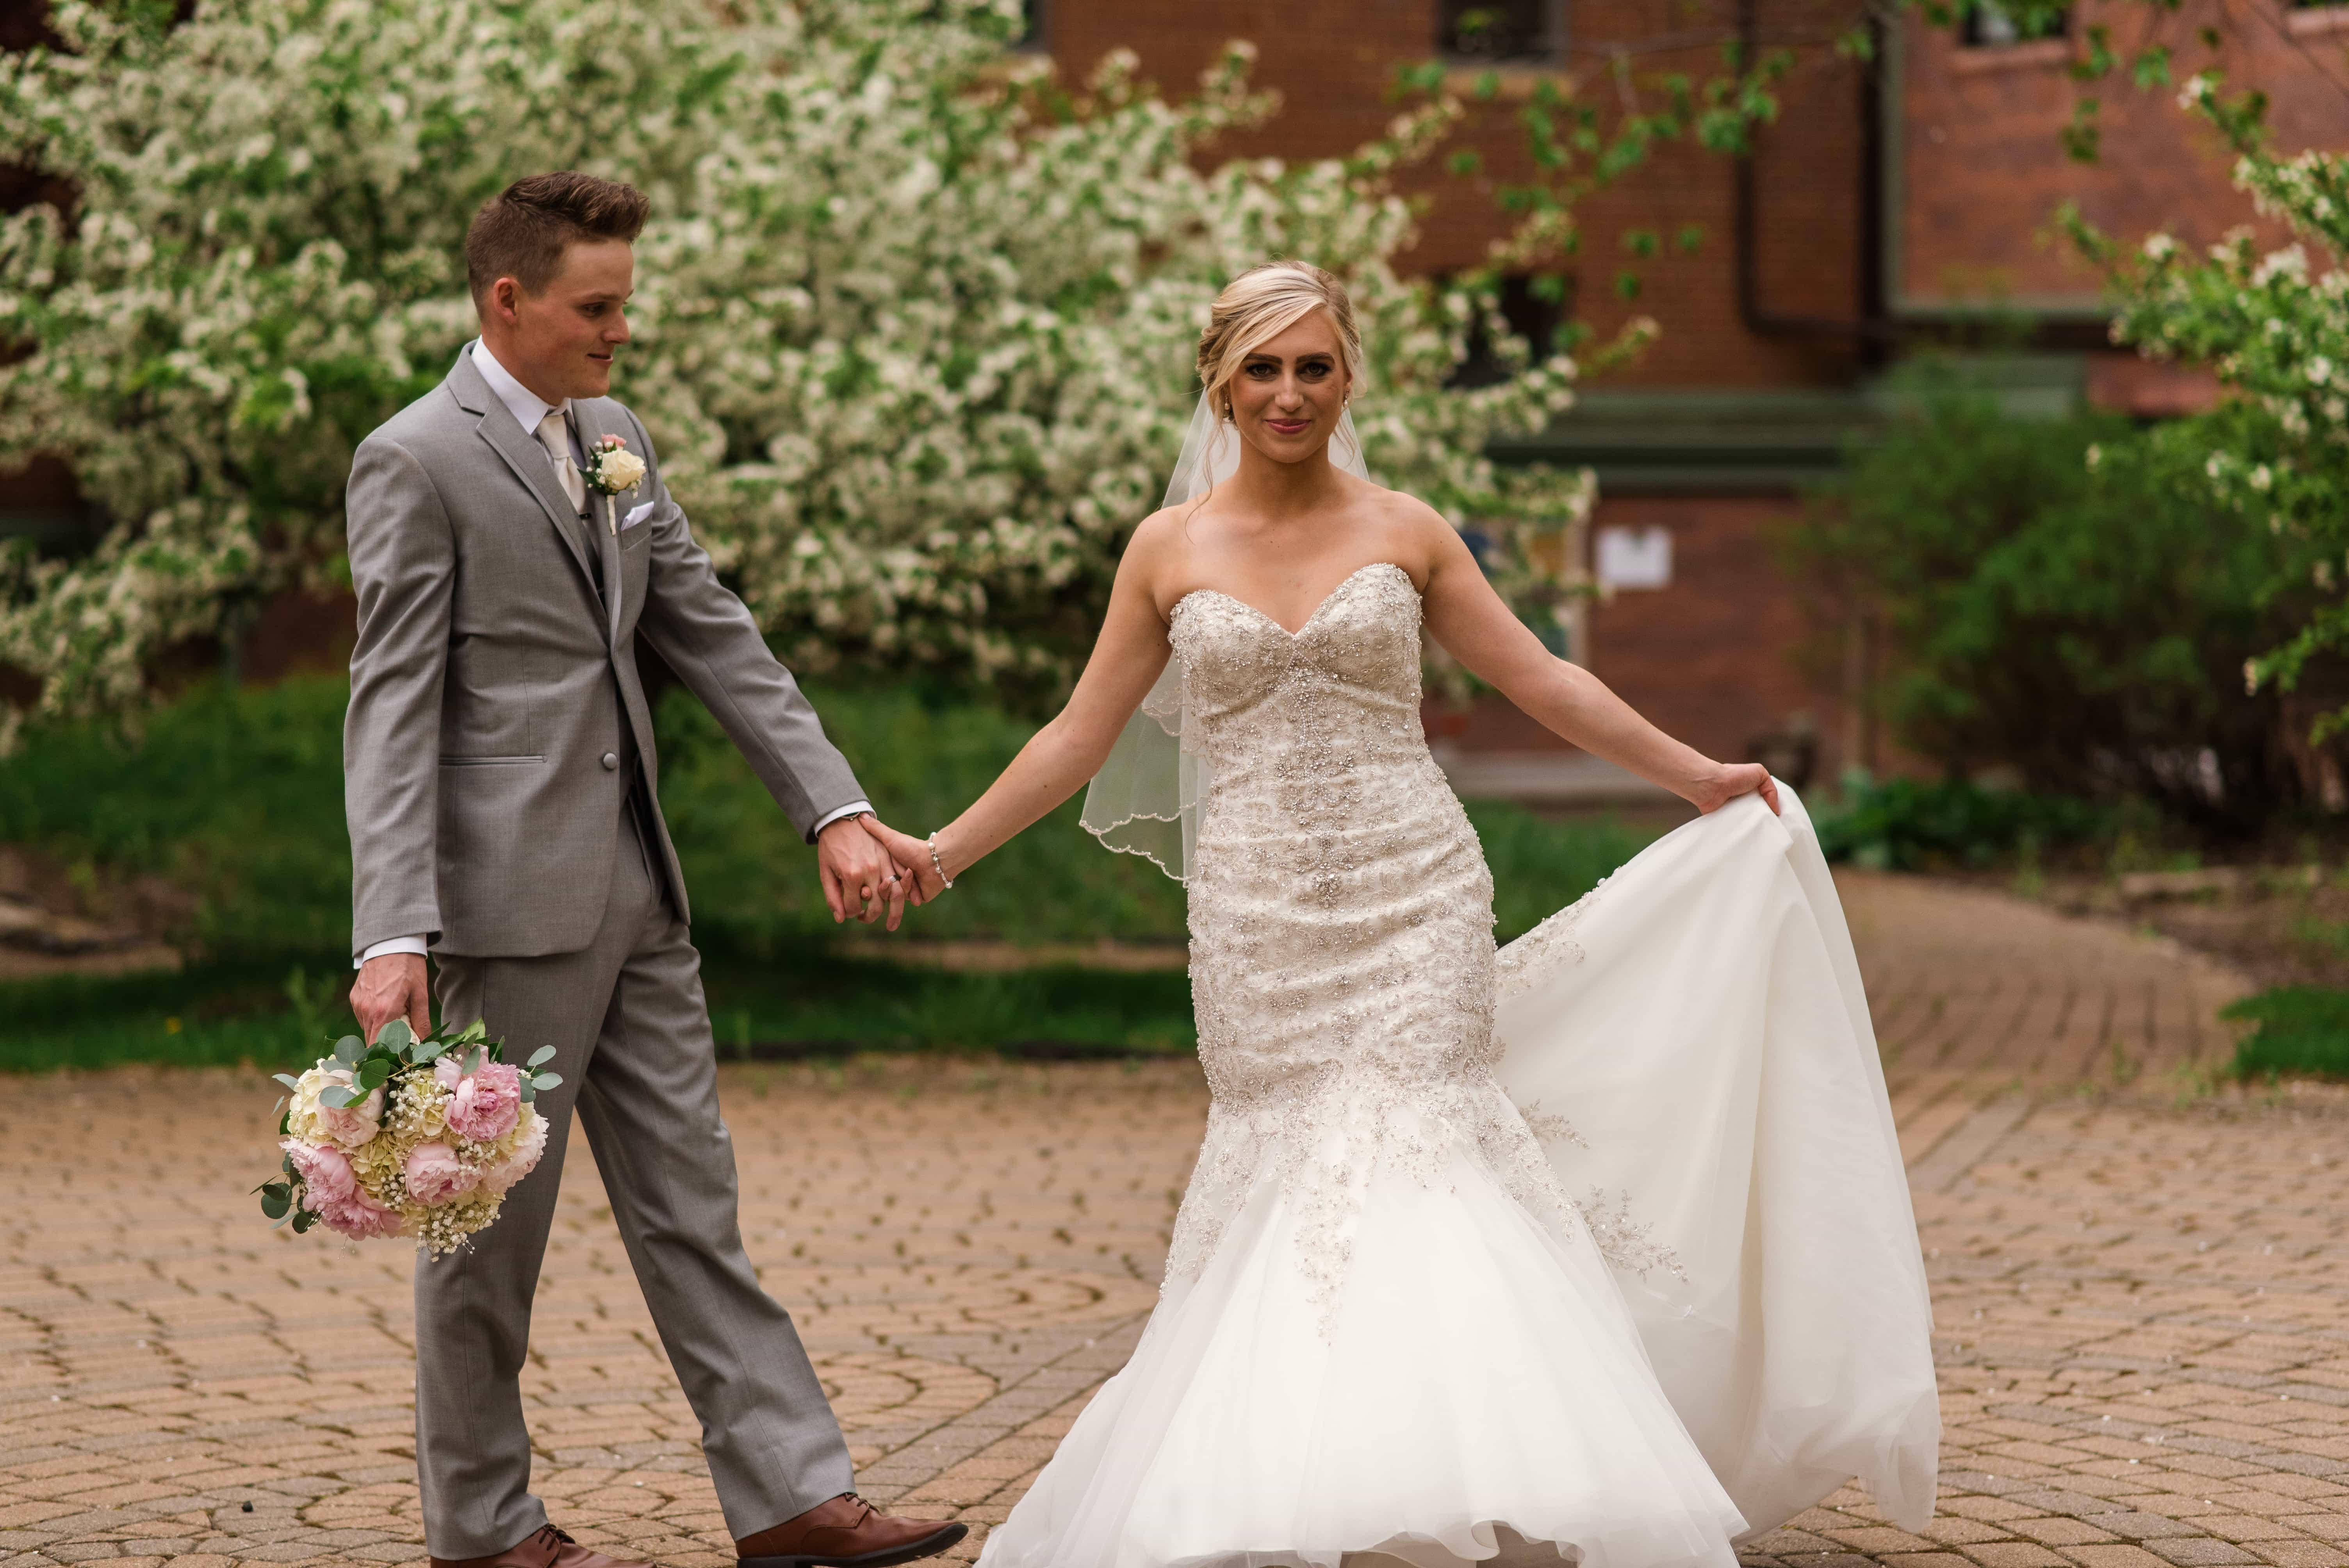 Nick and Andrea The Inn at St Johns Wedding Plymouth Michigan - 134